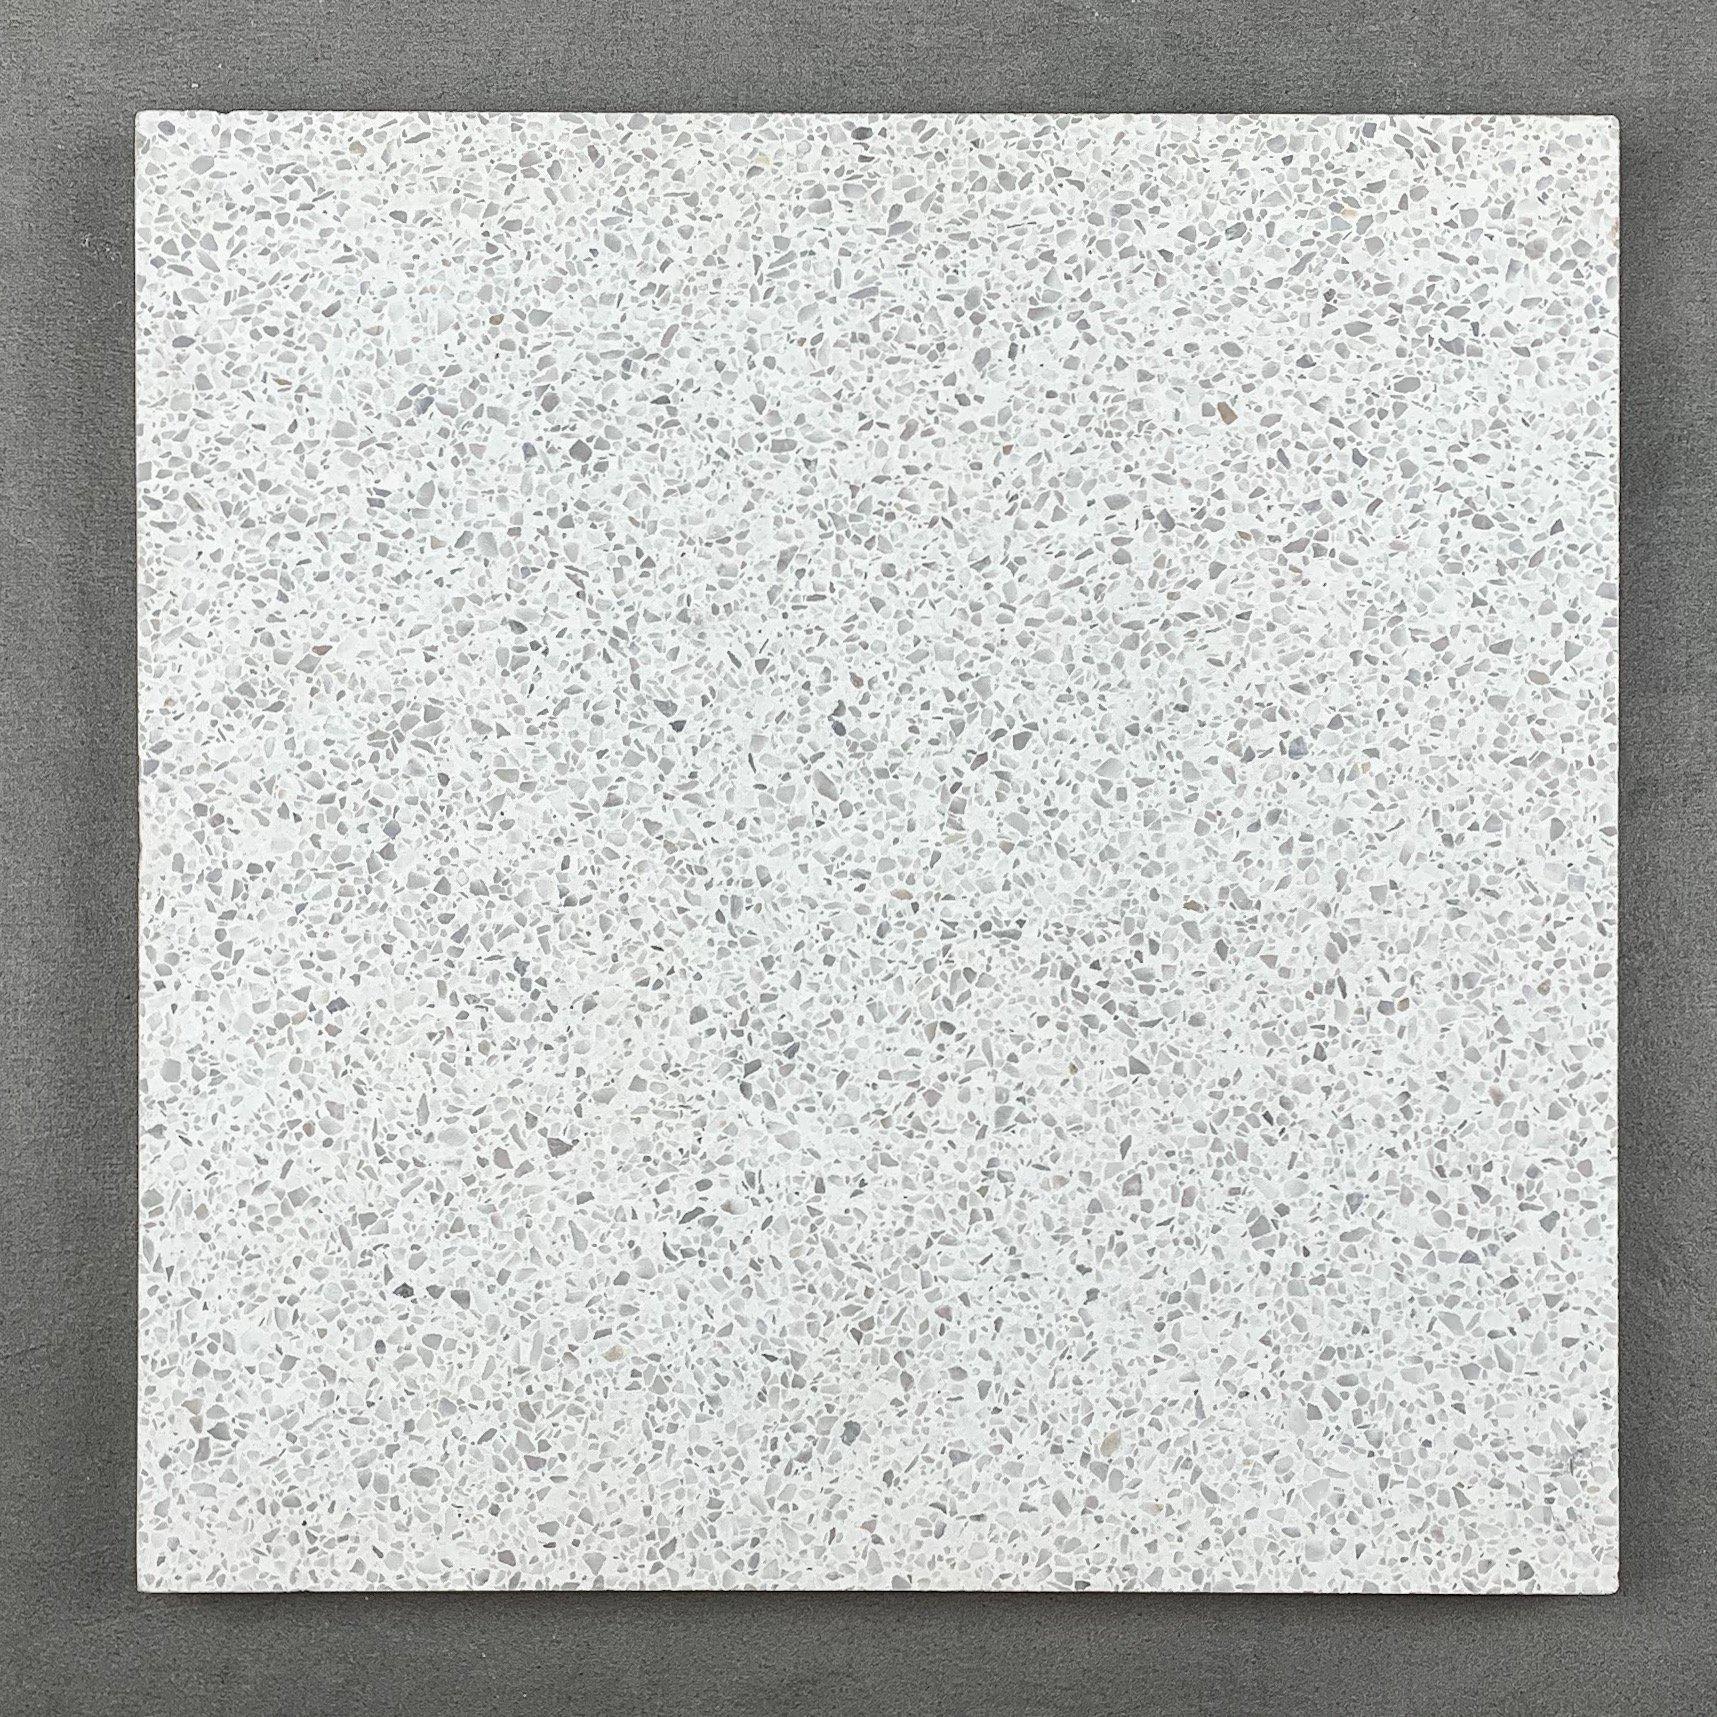 Alameda 3mm Terrazzo Tiles